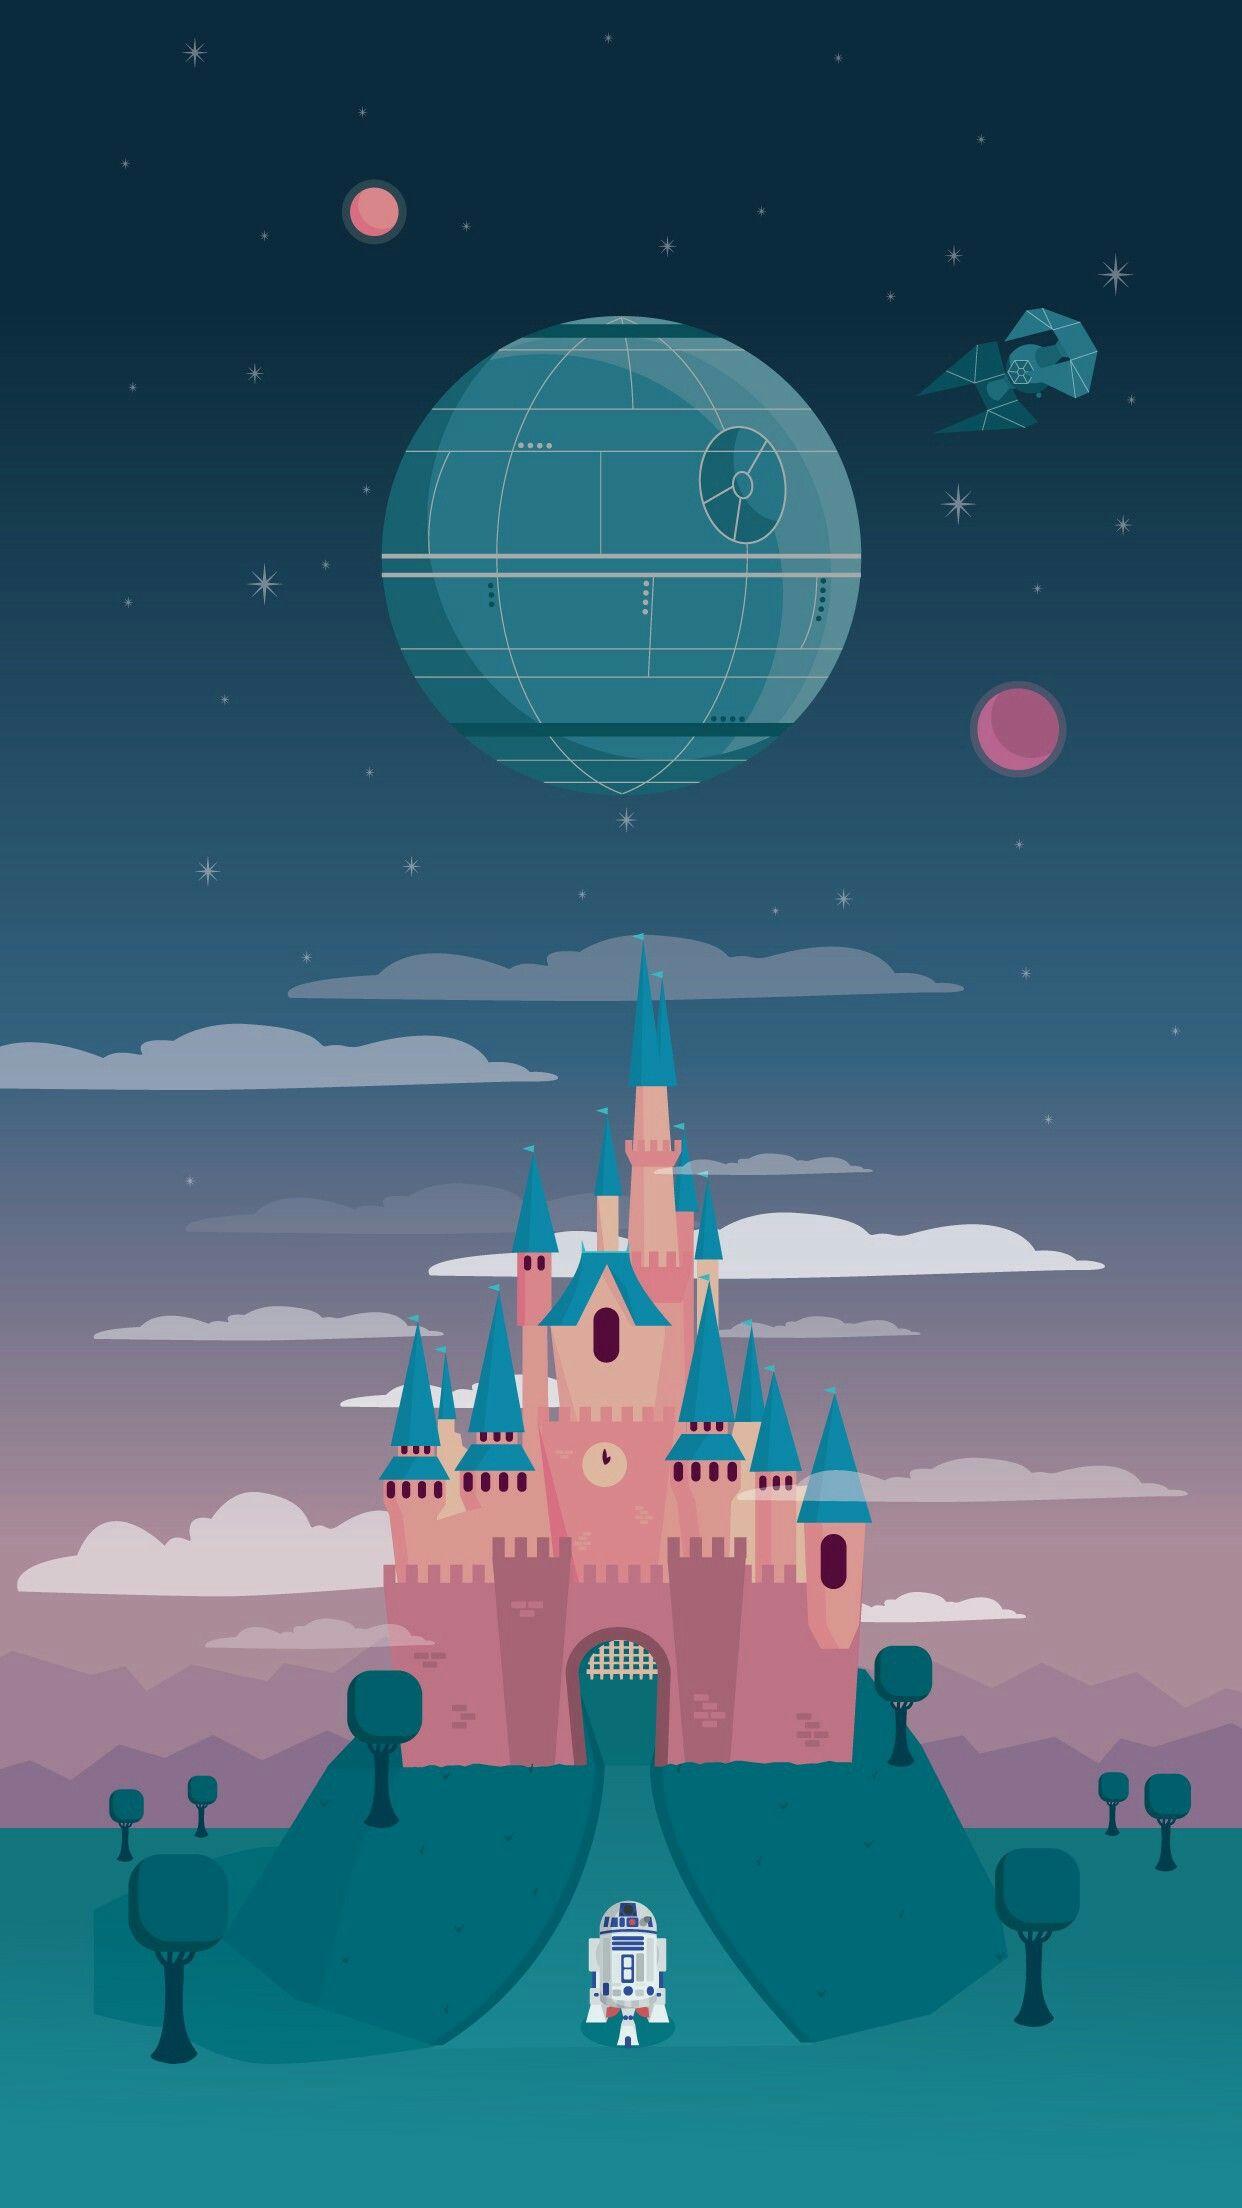 Star Wars Disney Castle Wallpaper Iphone Disney Disney Phone Wallpaper Star Wars Wallpaper